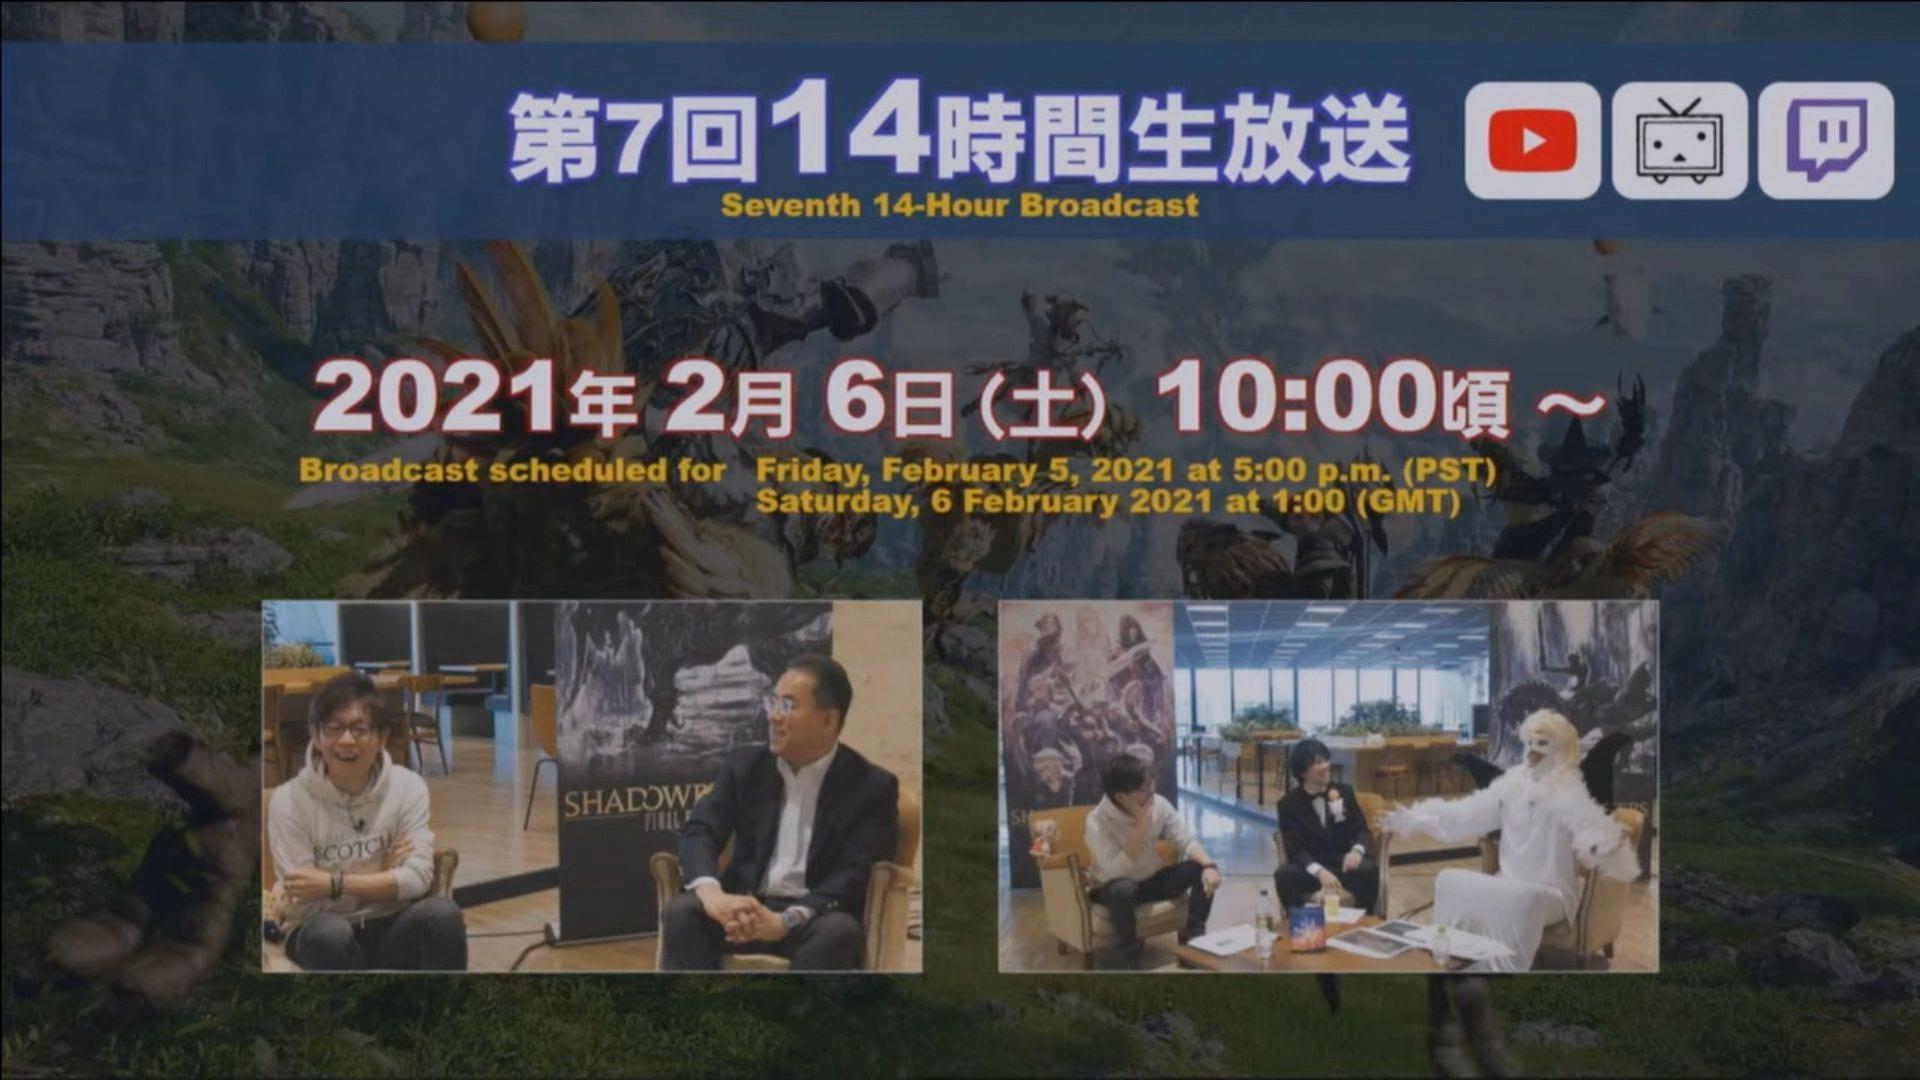 Final-Fantasy-XIV-Screenshot-2020-11-27-15-06-55.jpg?ssl=1